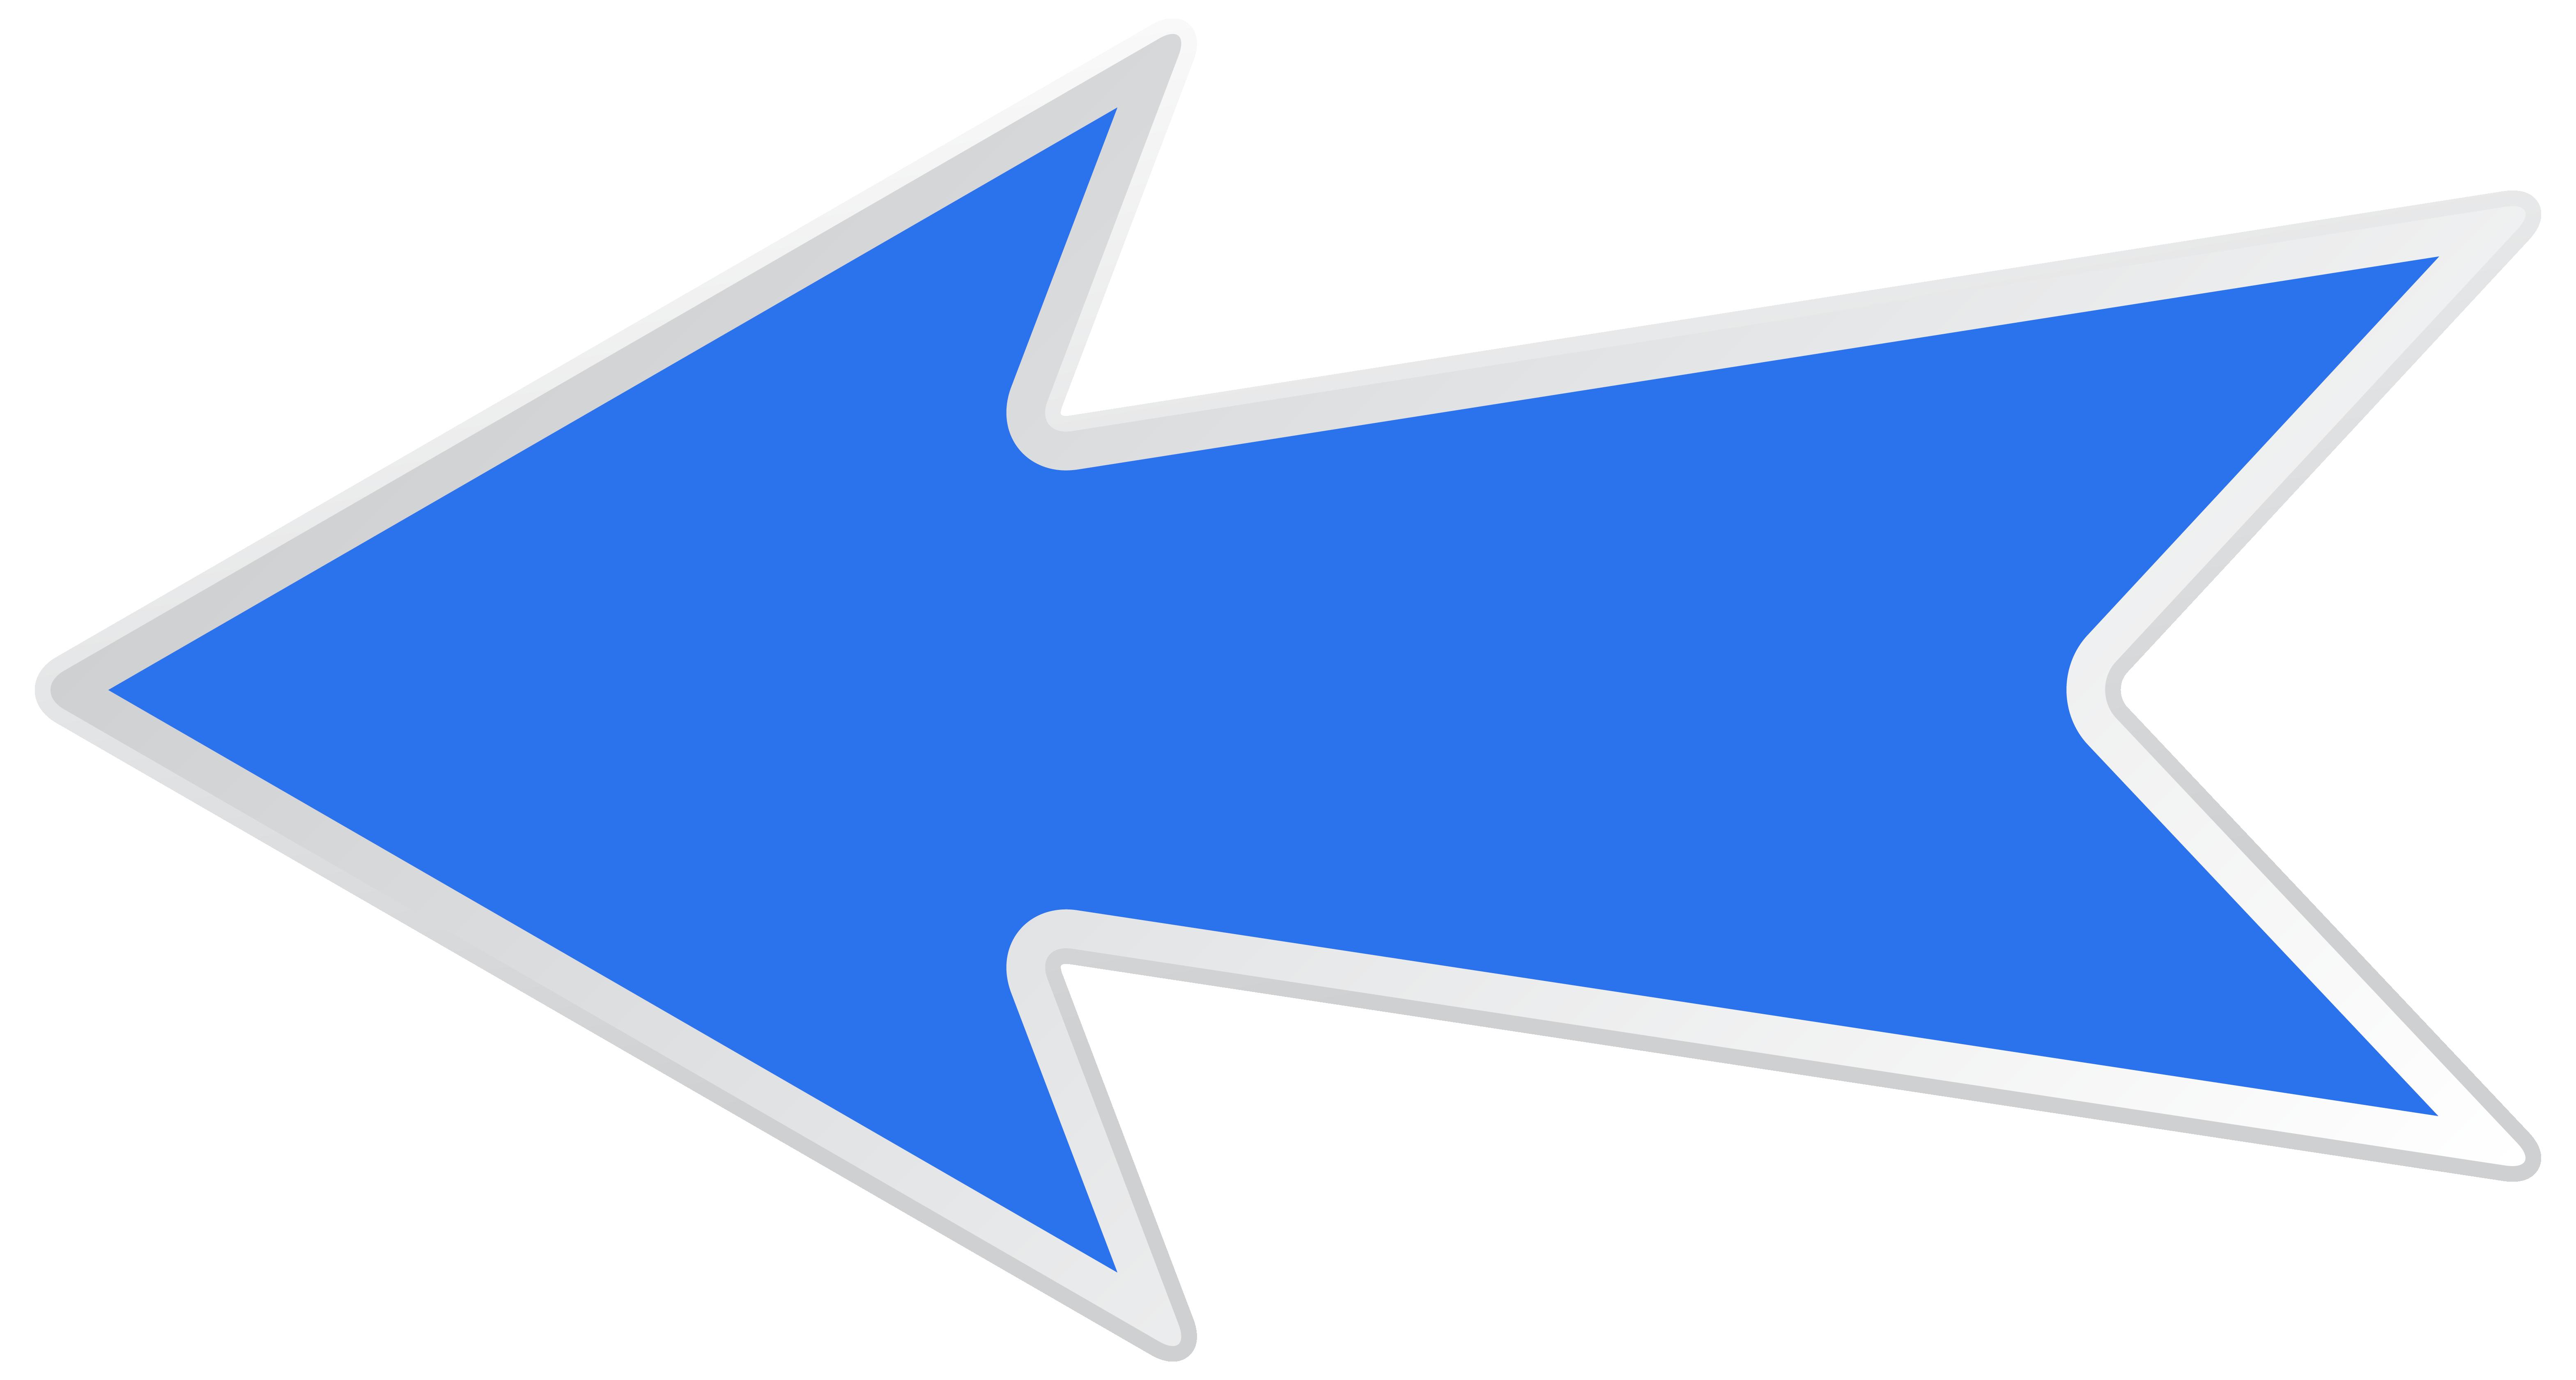 6273x3361 Blue Left Arrow Png Clip Art Imageu200b Gallery Yopriceville